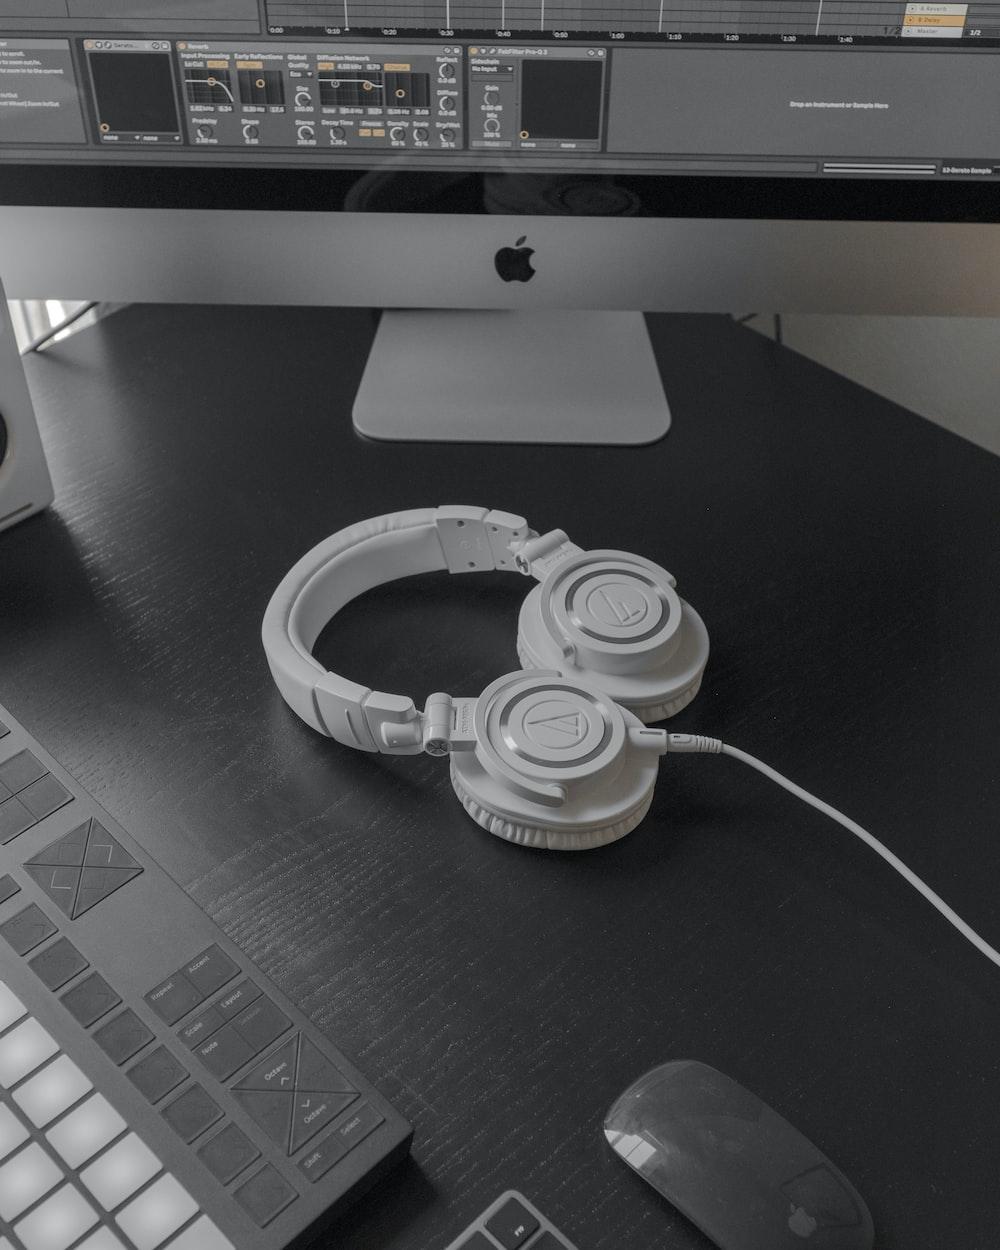 white and black headphones on black table